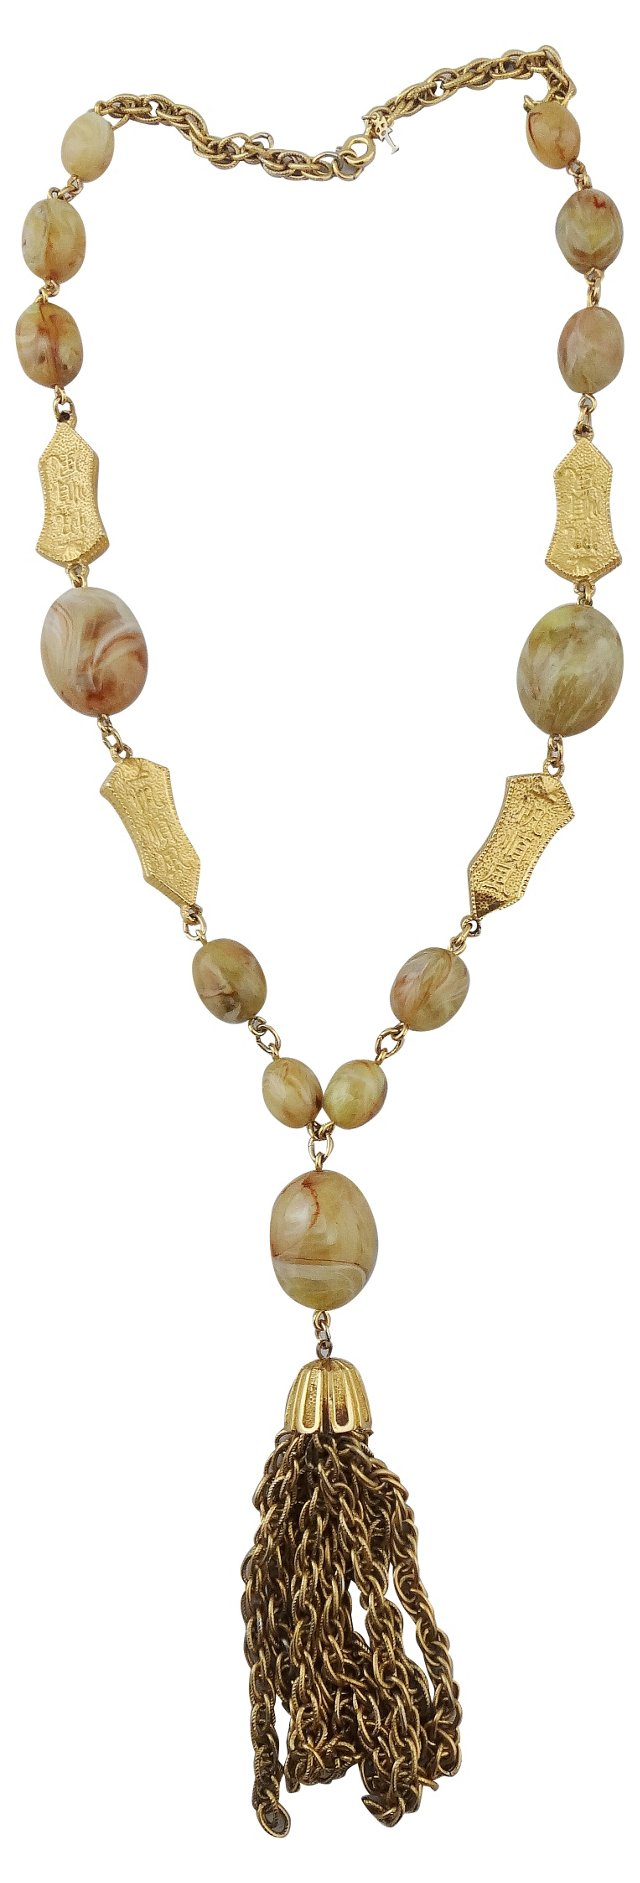 Trifari Faux-Jade Tassel Necklace